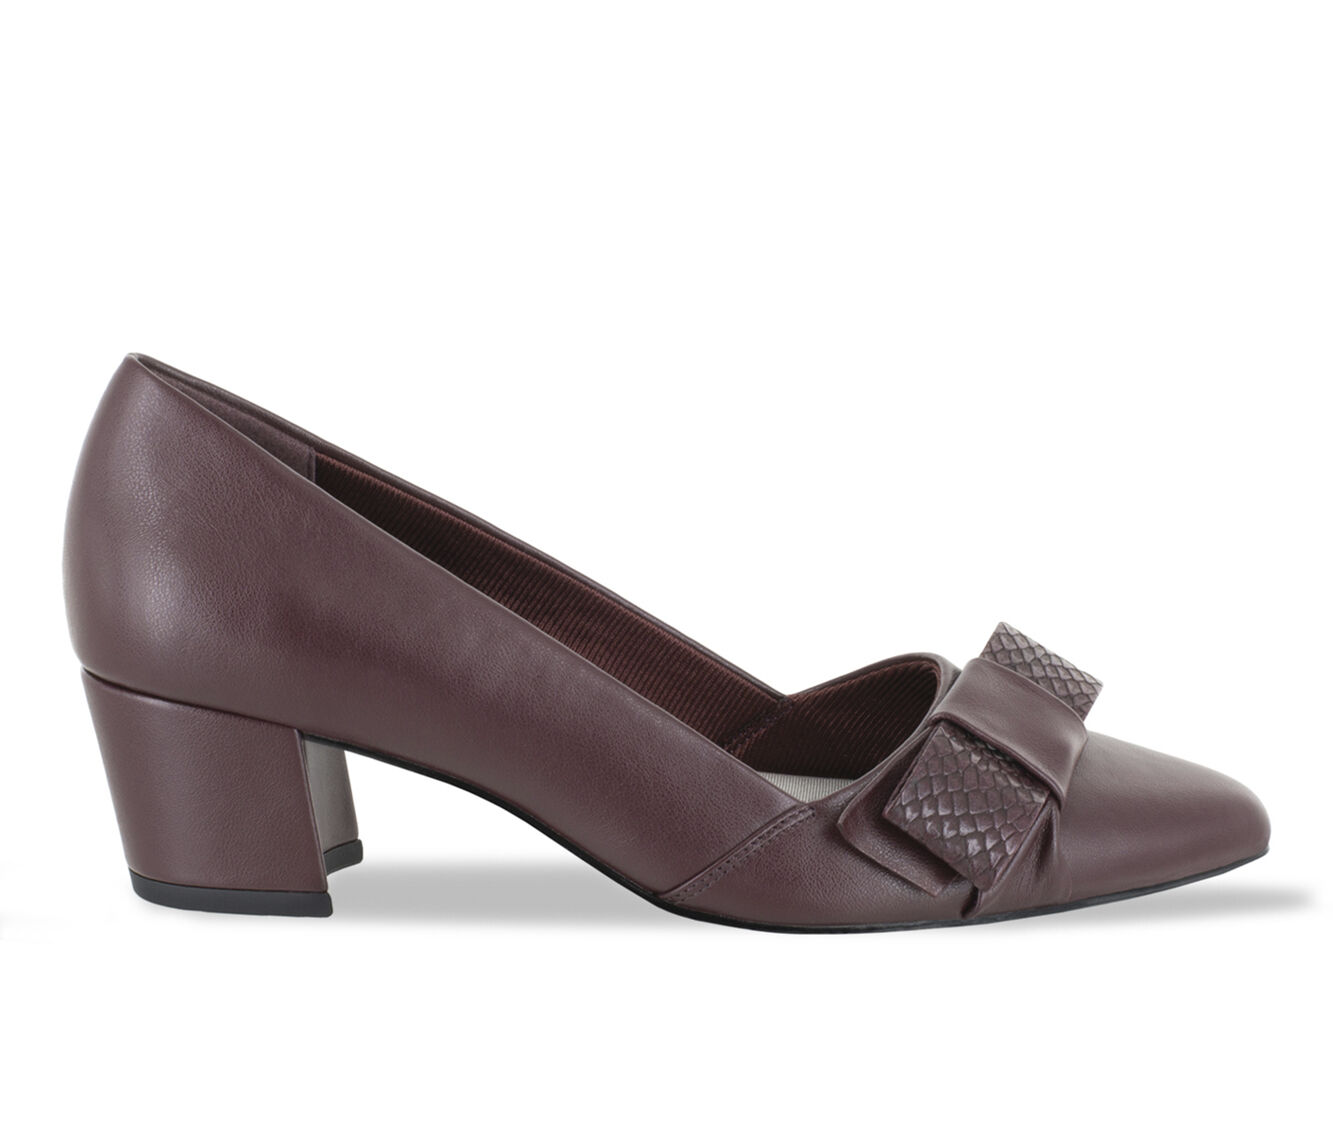 uk shoes_kd5739